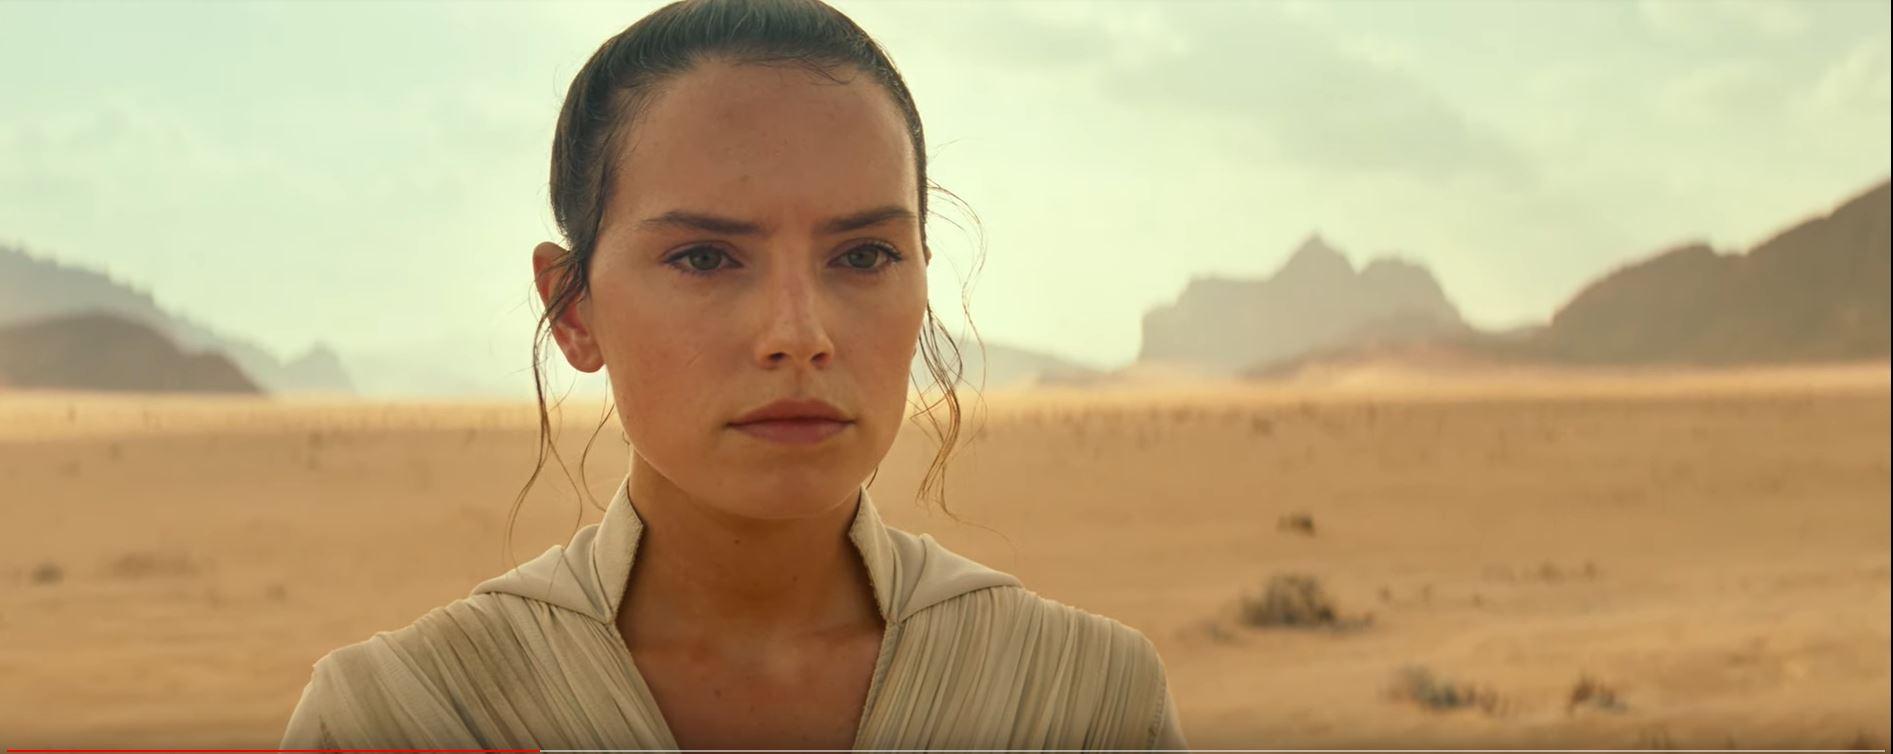 Star Wars The Rise of Skywalker Rey training in the desert